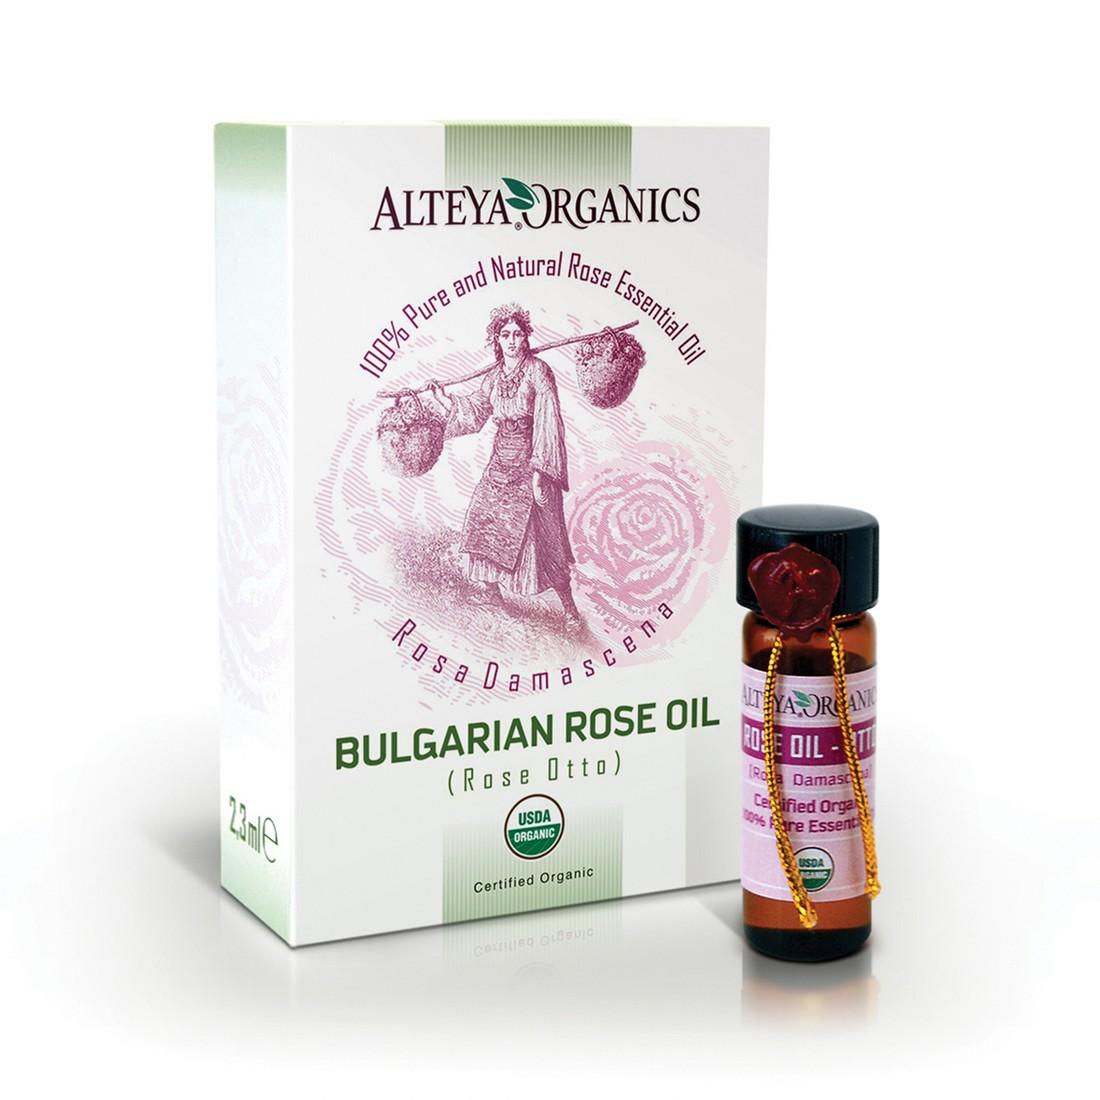 Био органично българско розово масло Alteya Organics 2,3 мл.